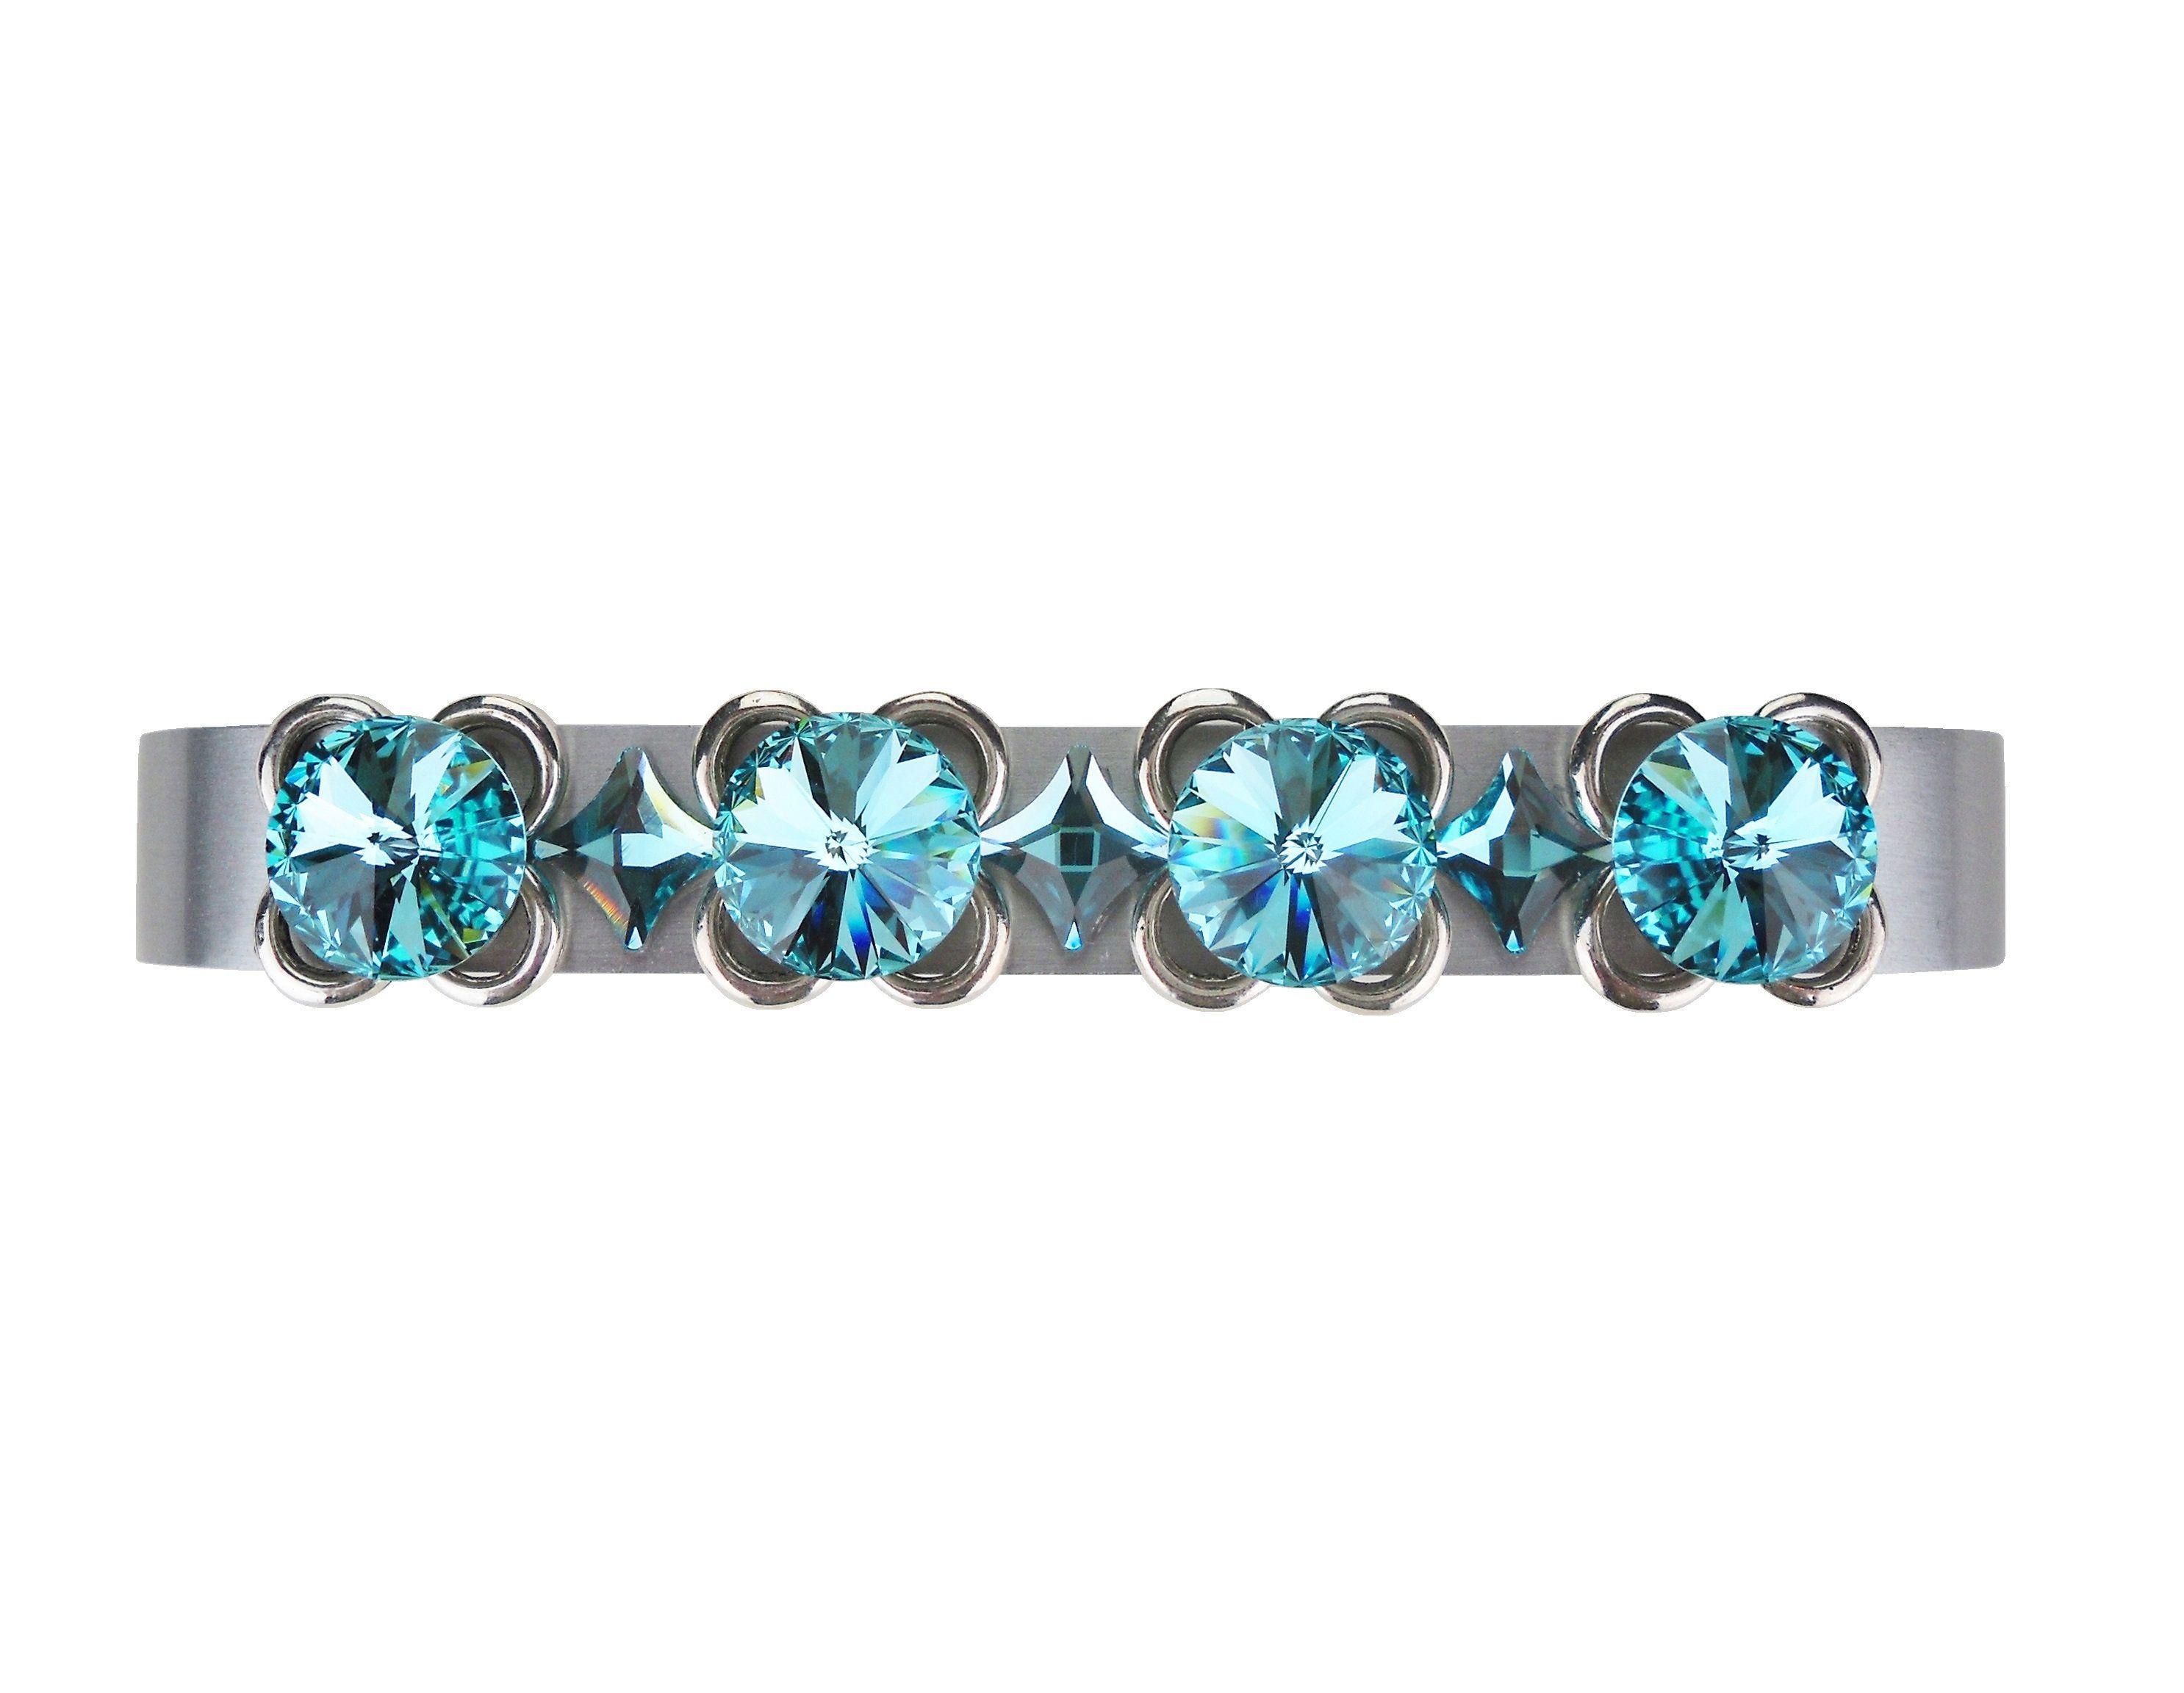 4 Drawer Pull Swarovski Crystal Turquoise Handle 4 Inch Teal